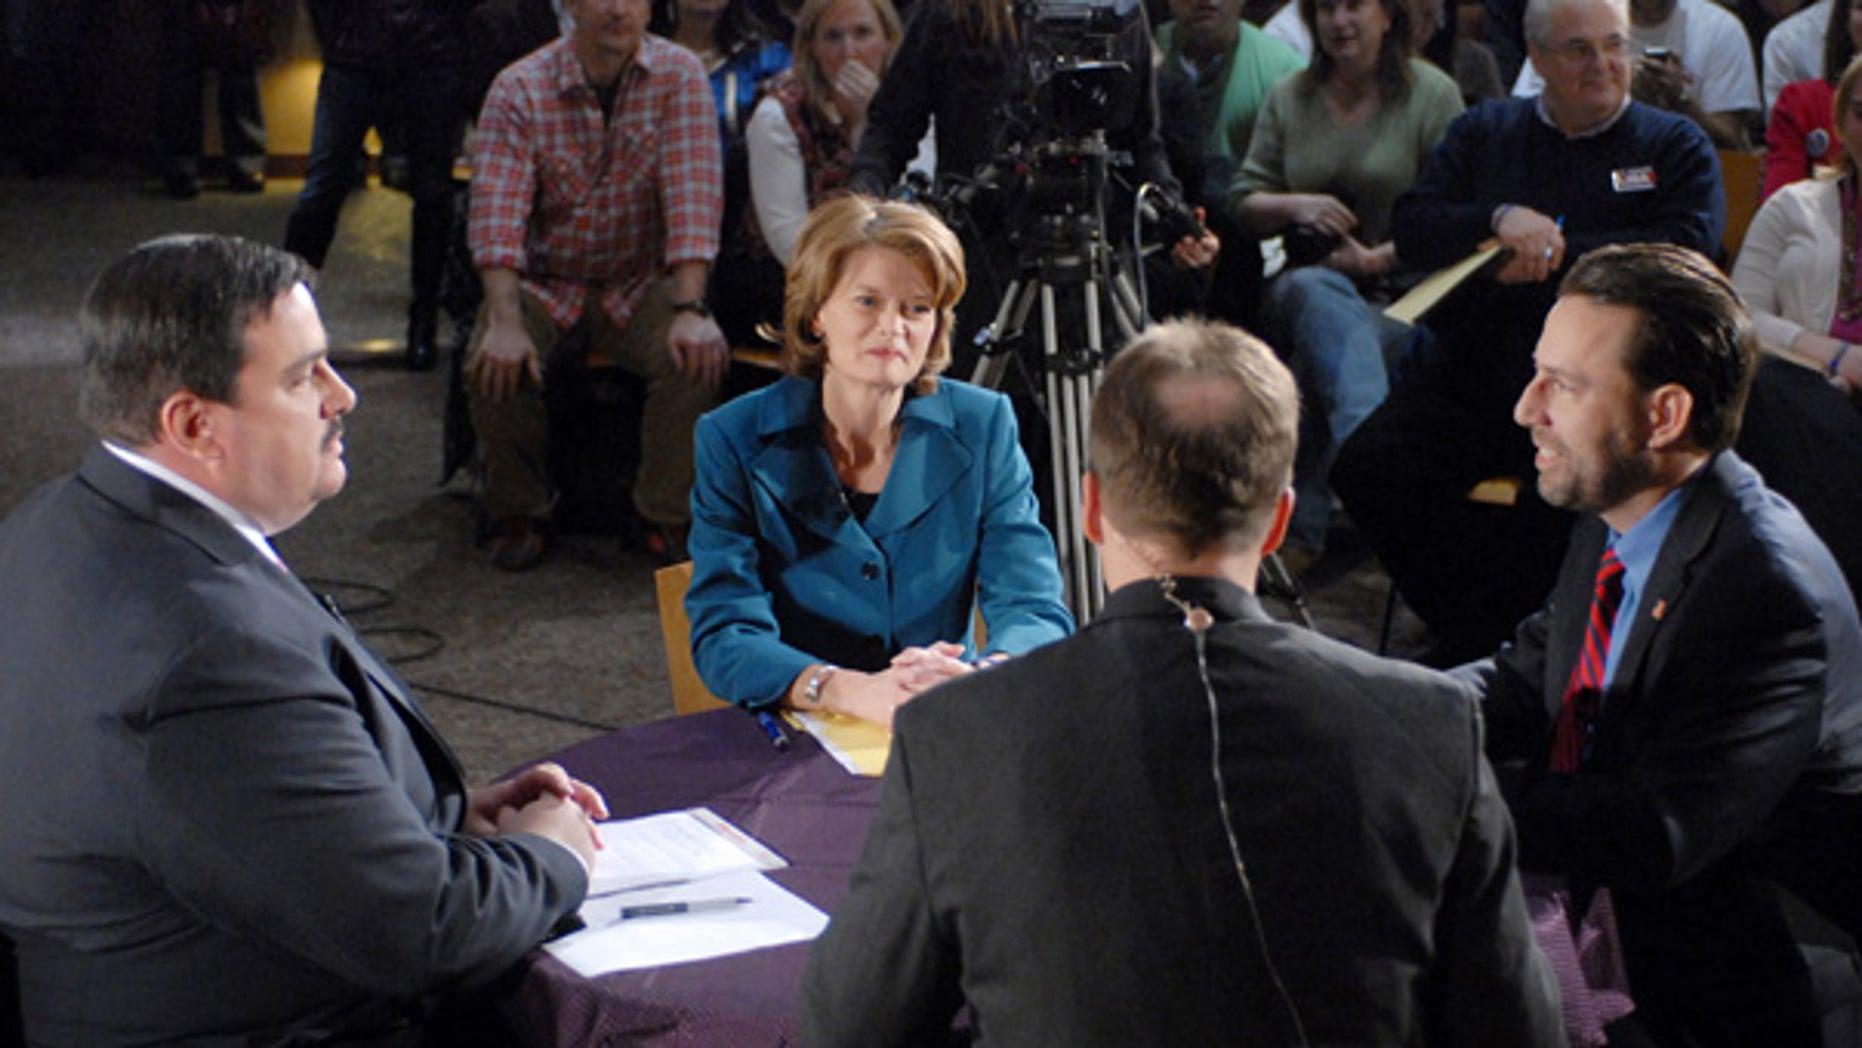 Oct. 24: U.S. Senate Democratic candidate Scott McAdams, left, write-in candidate Sen. Lisa Murkowski, center, and Republican candidate Joe Miller debate in Anchorage.